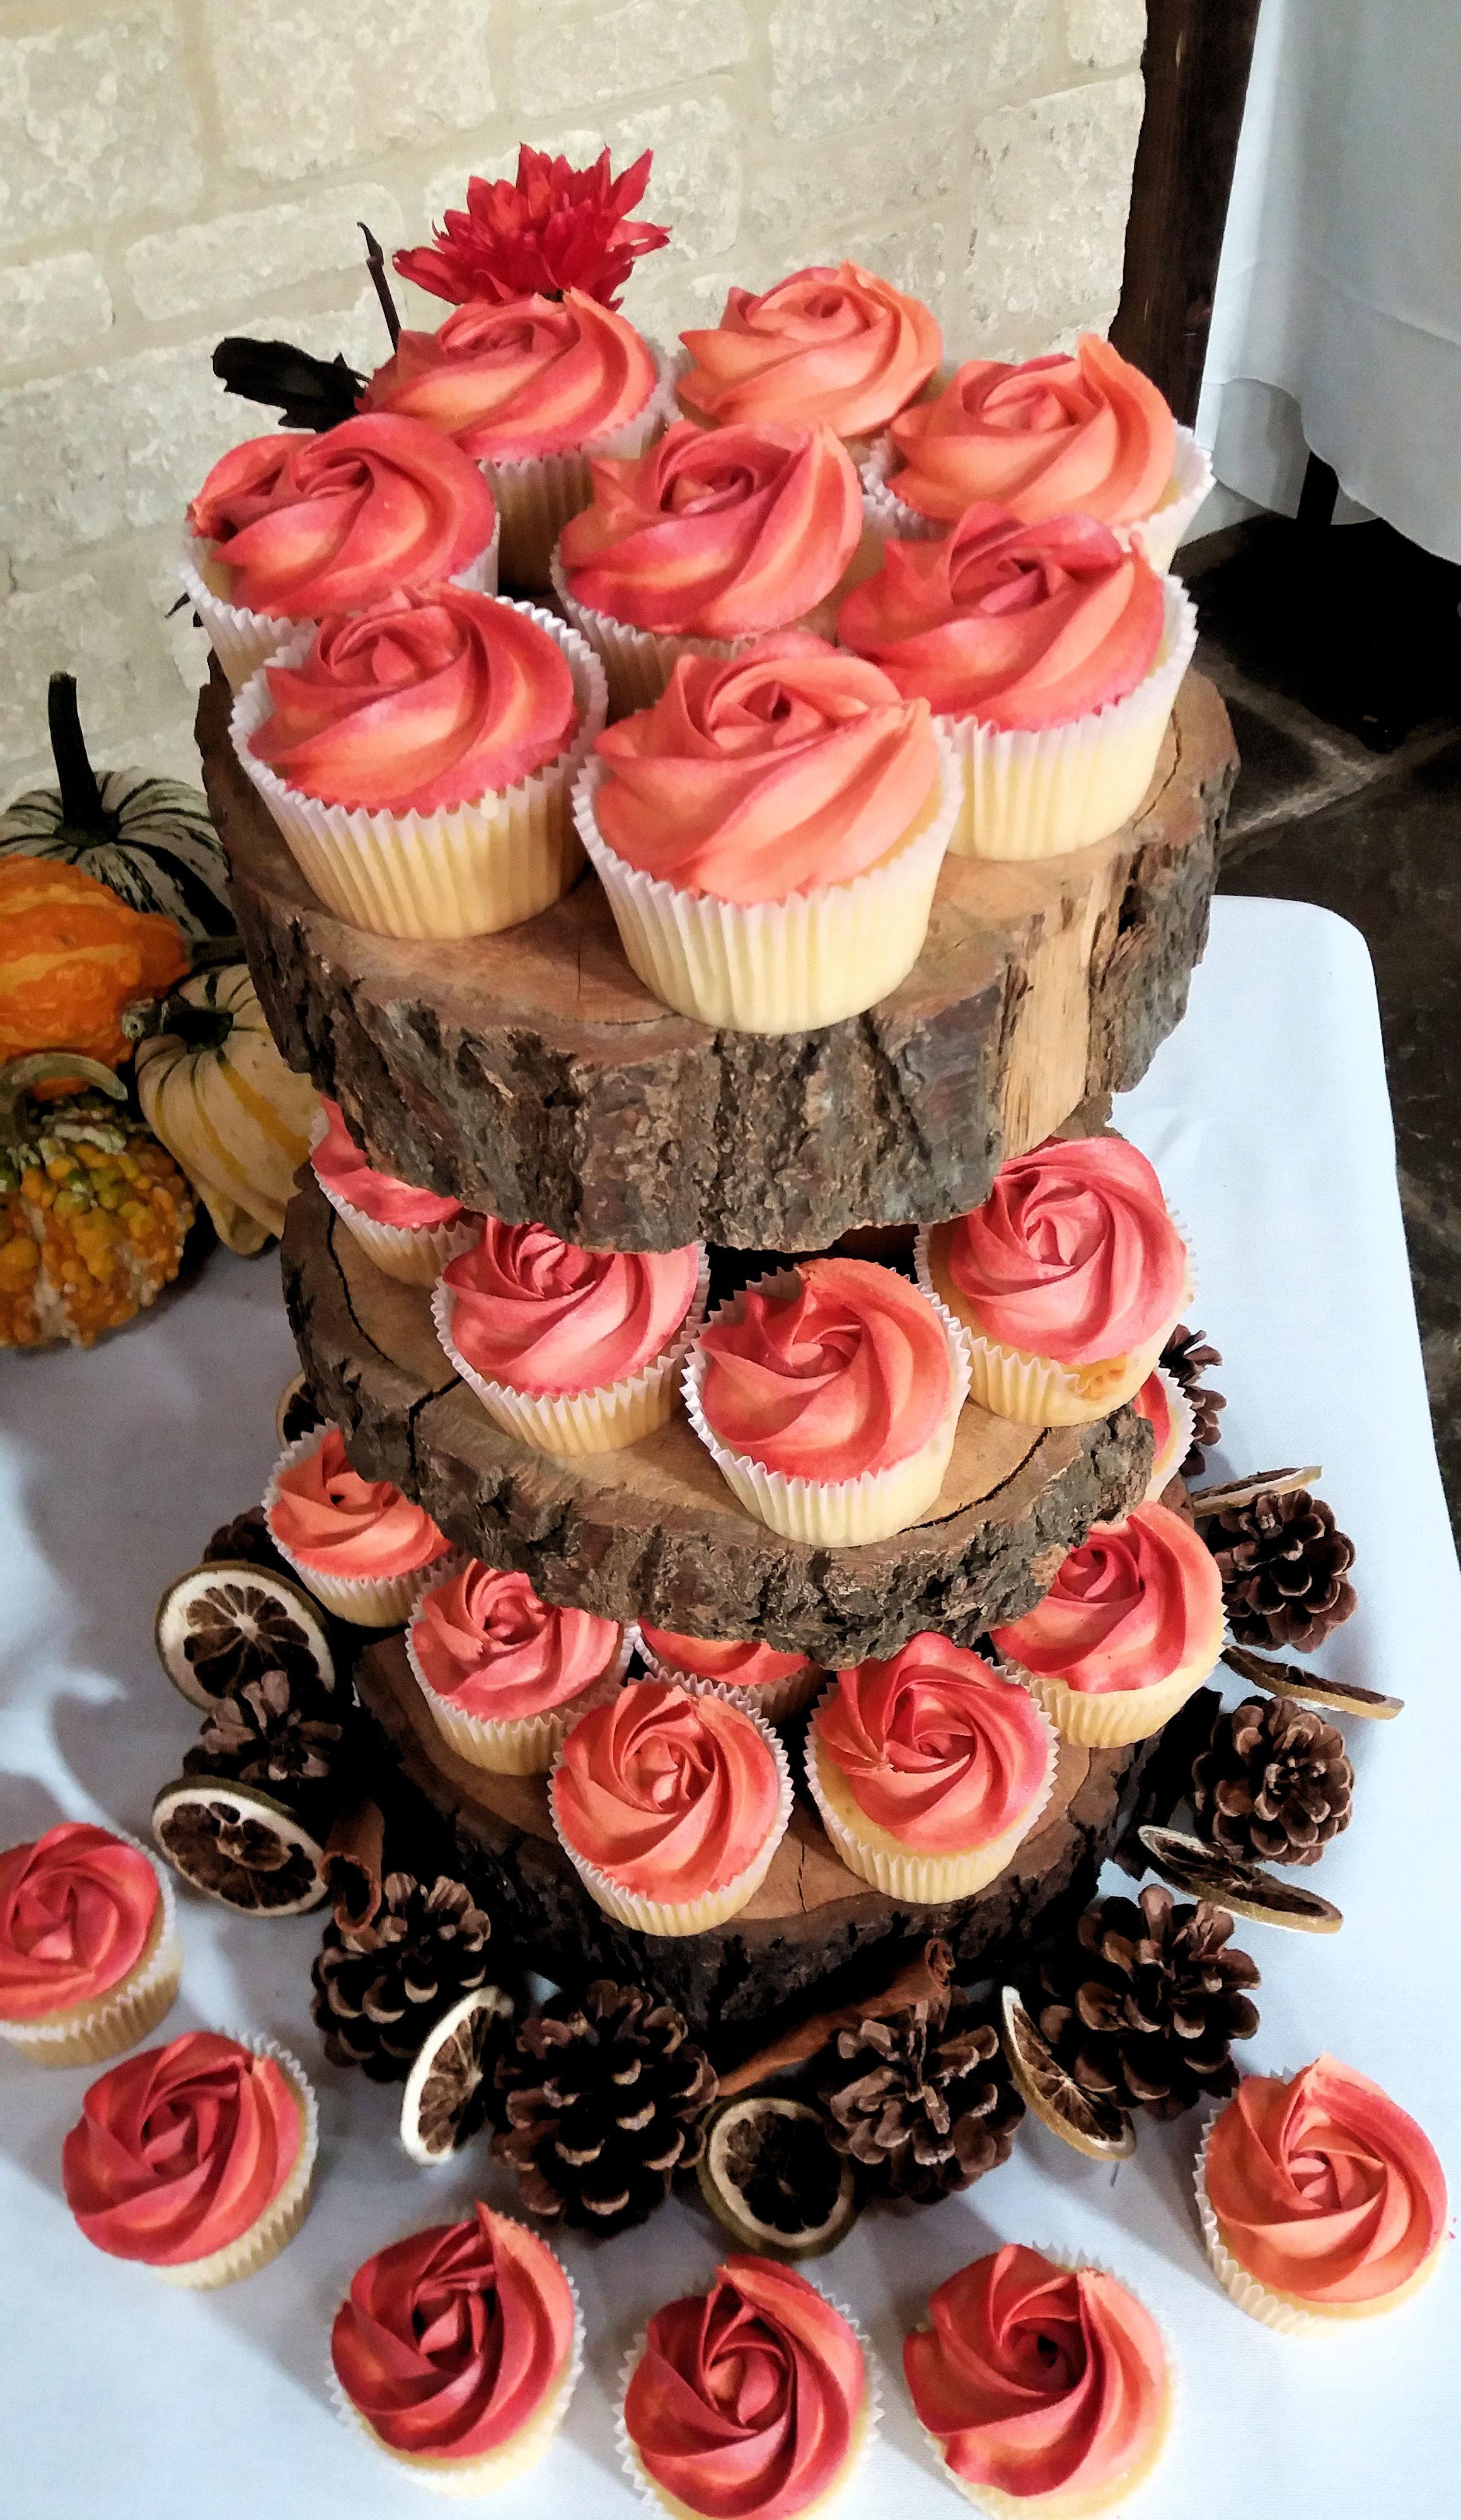 Ombre Rose Wedding Cake & Cupcakes2.jpg